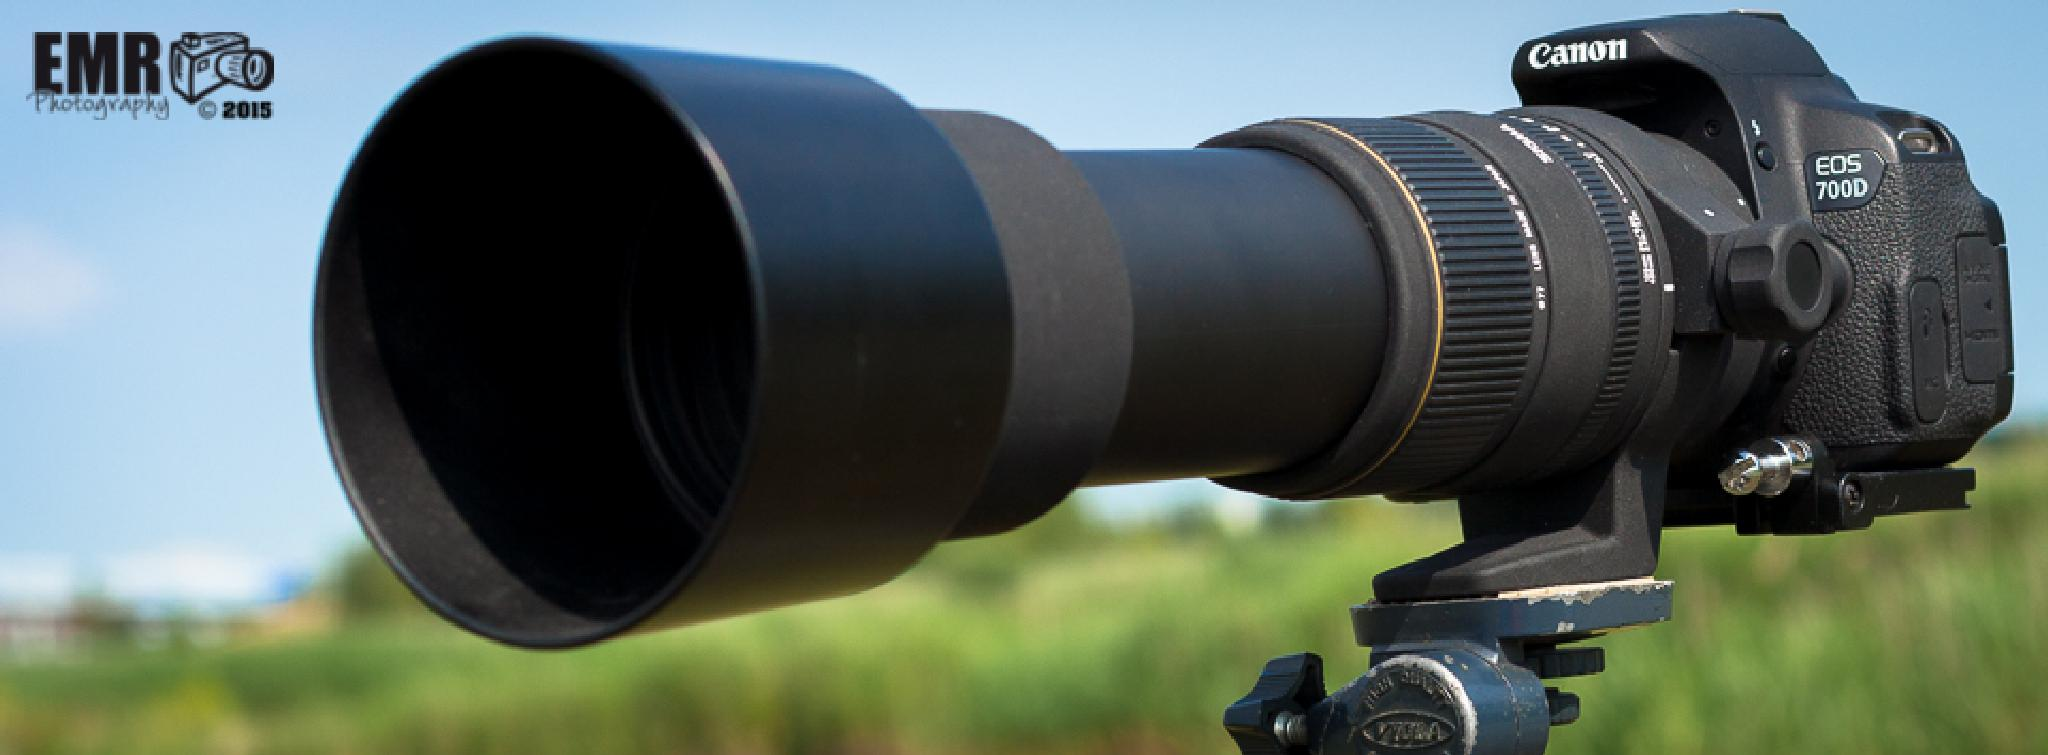 Sigma 135-400mm 1:4.5-5.6 apo dg by EMR Photography & Fotomodel Marijn